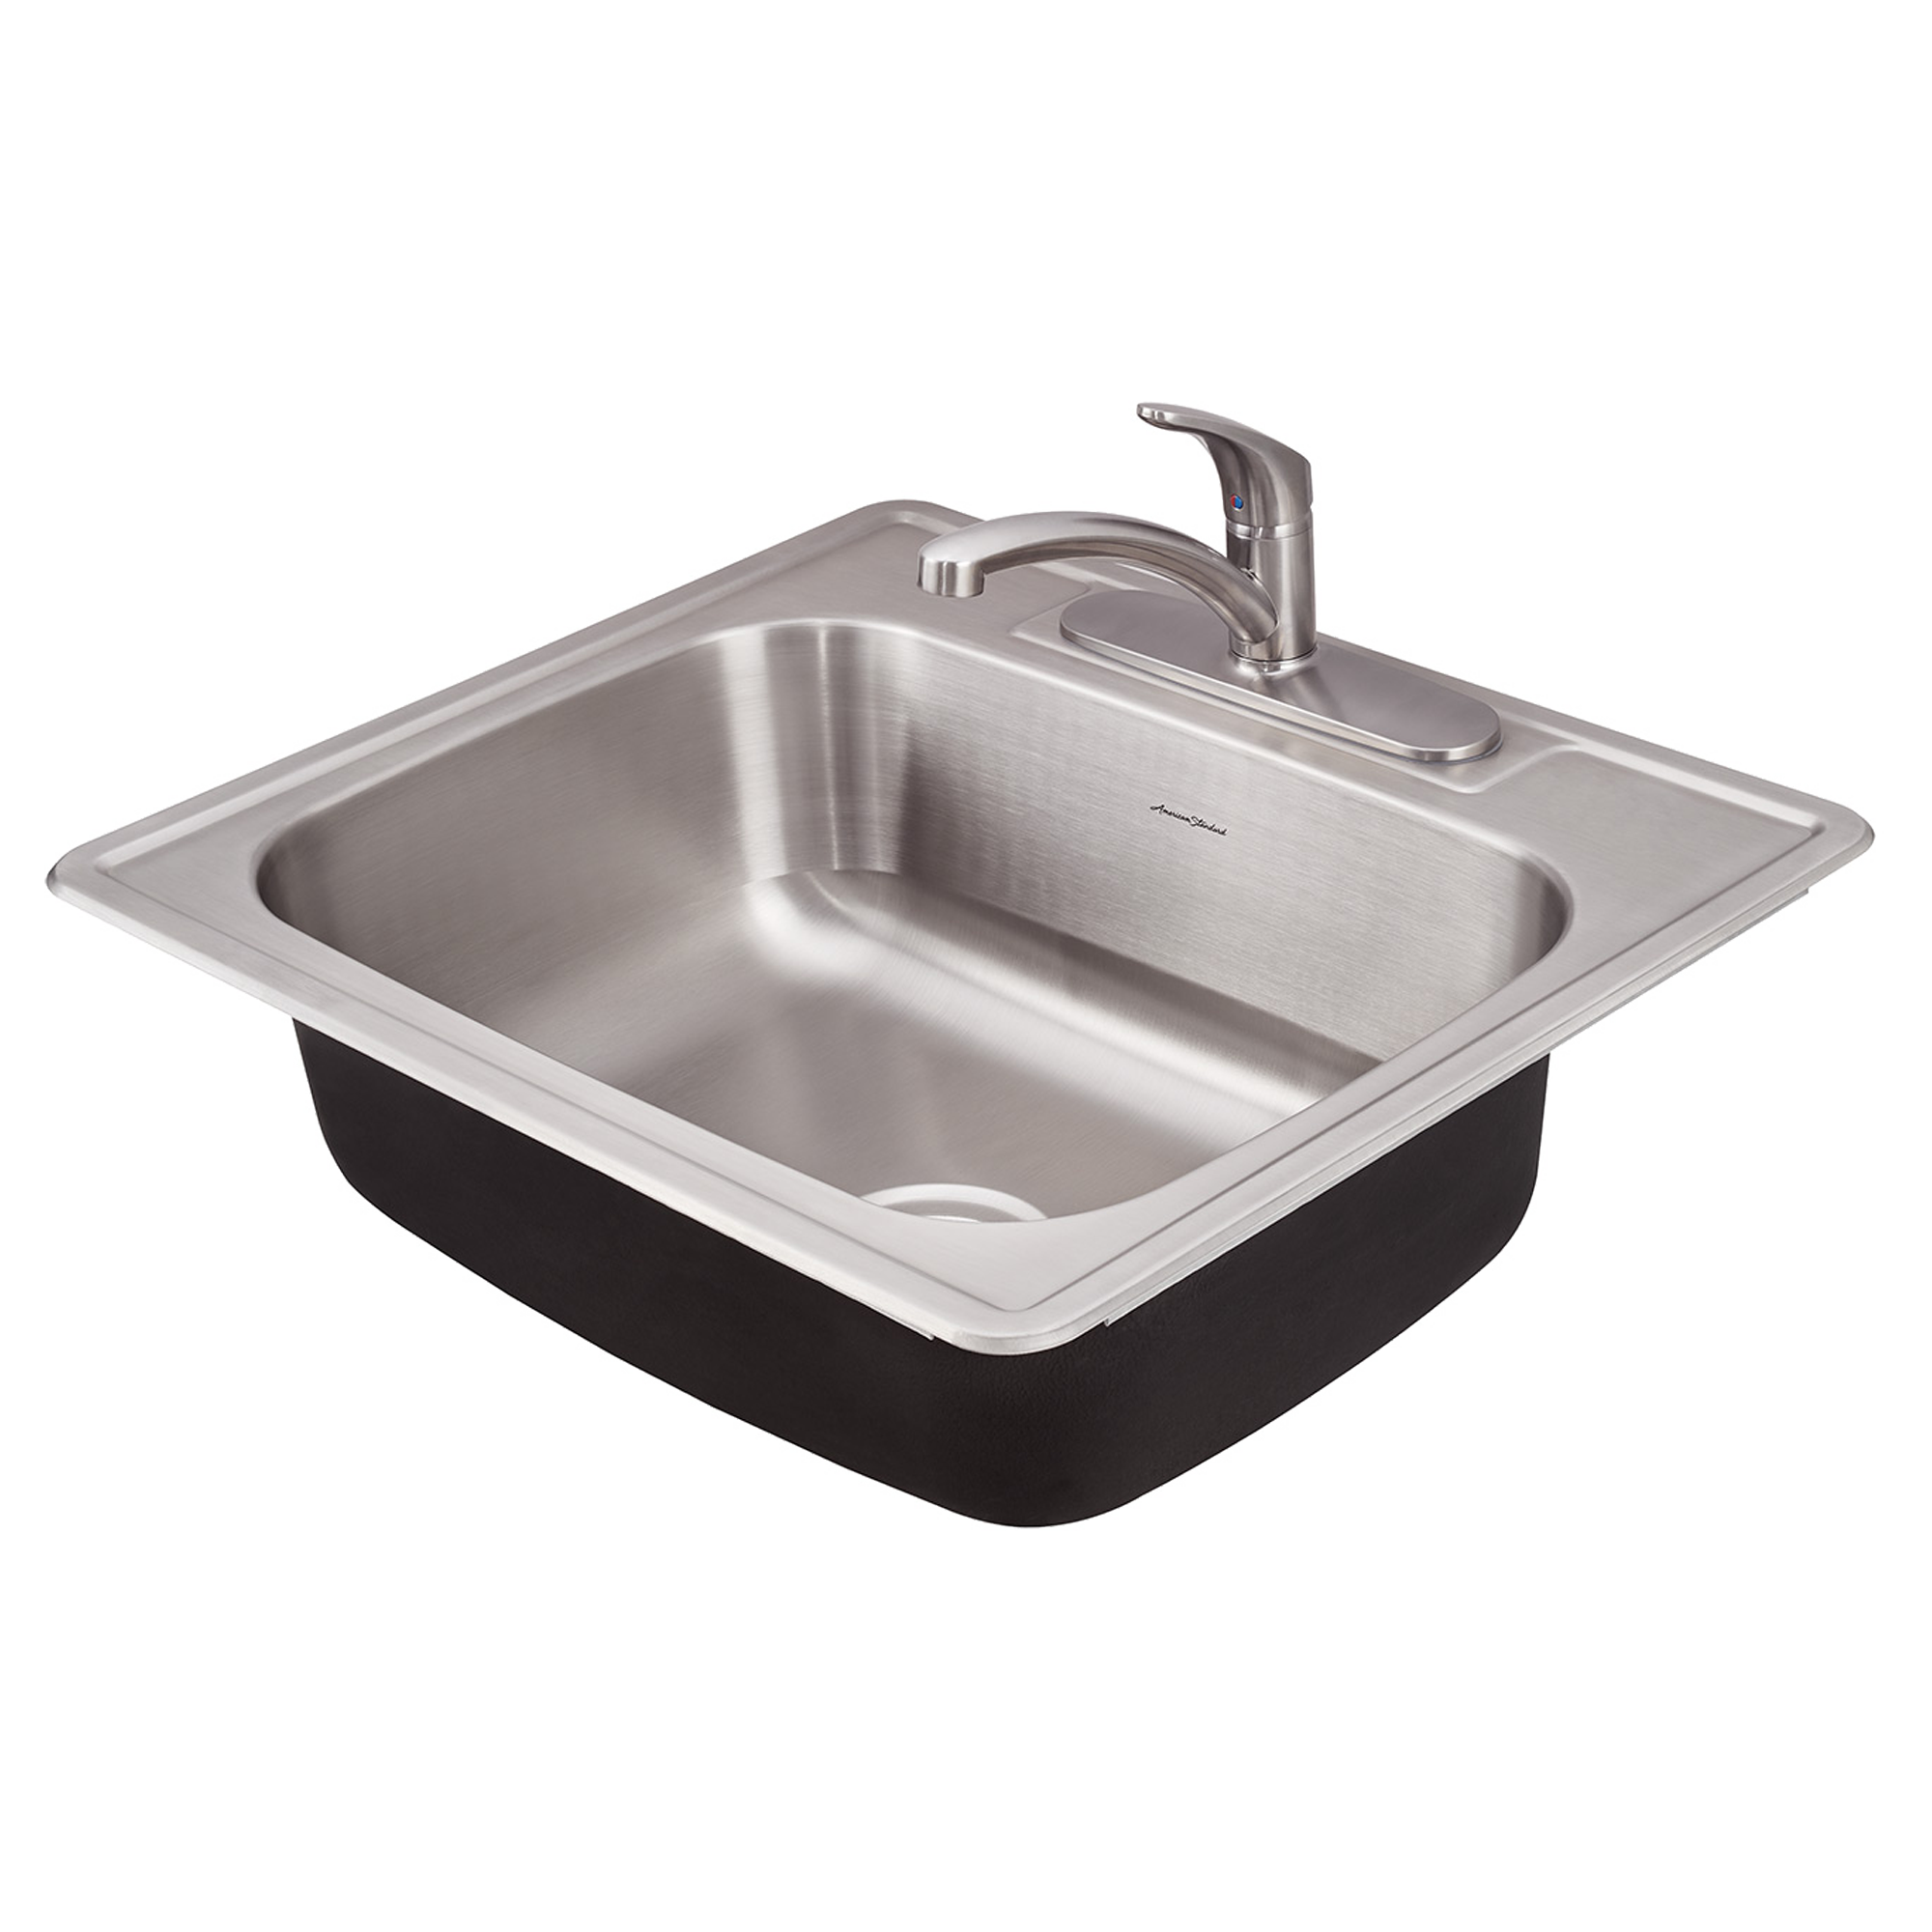 Colony ADA 25x22 Single Bowl Kitchen Sink Kit.